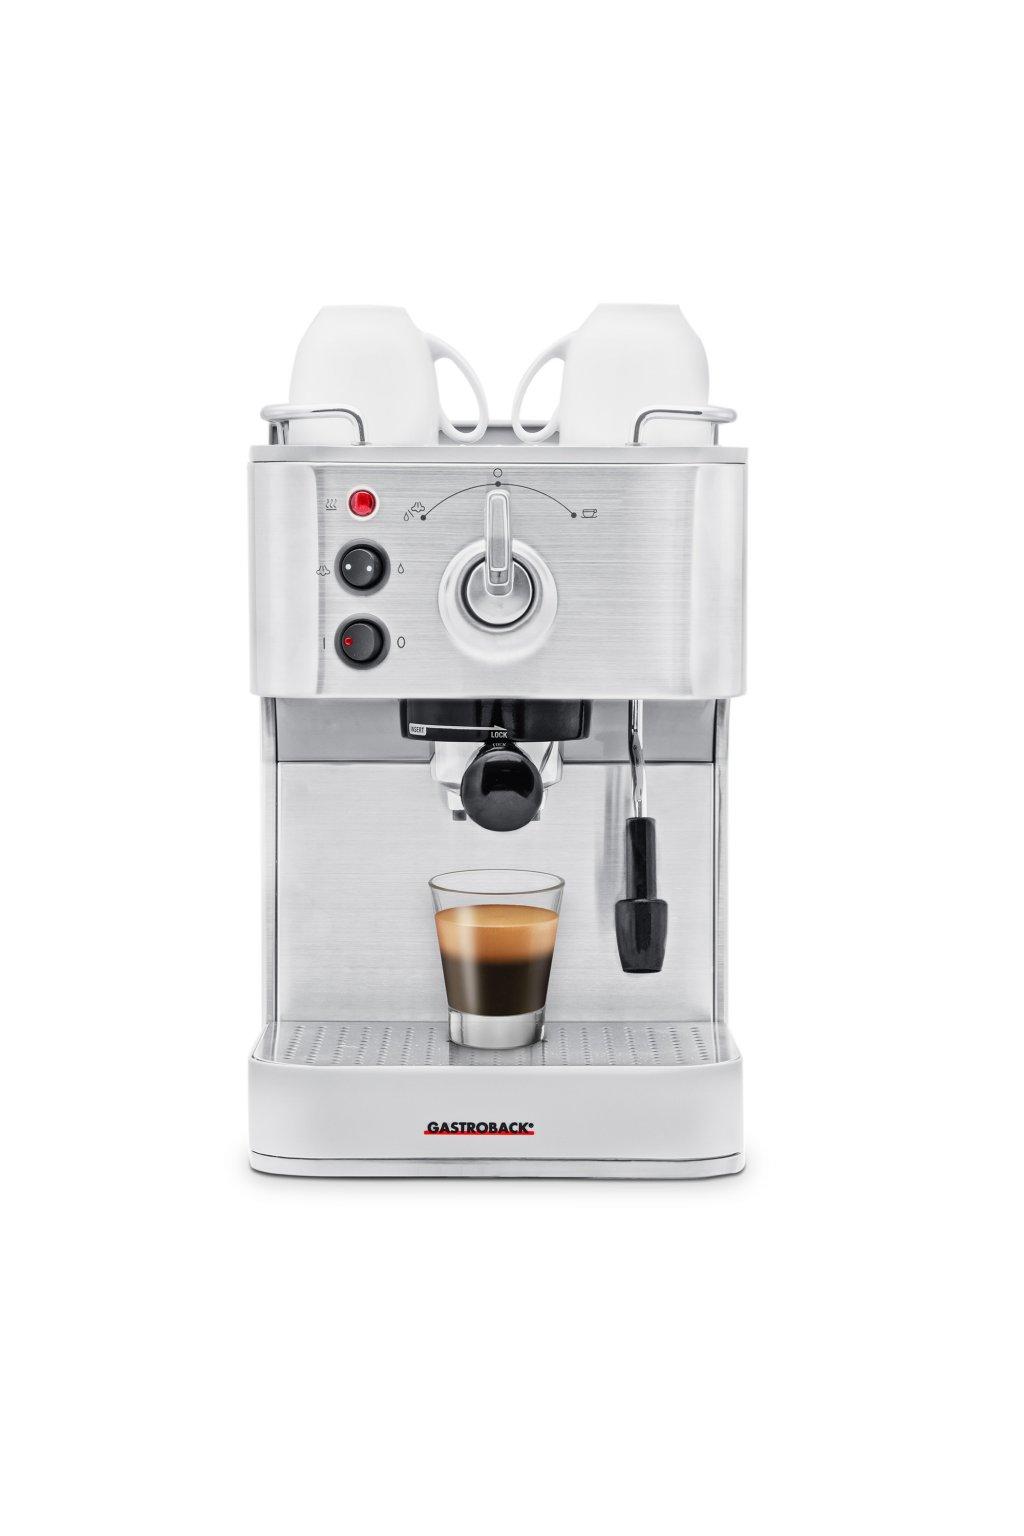 130919 1 pakove espresso gastroback 42606